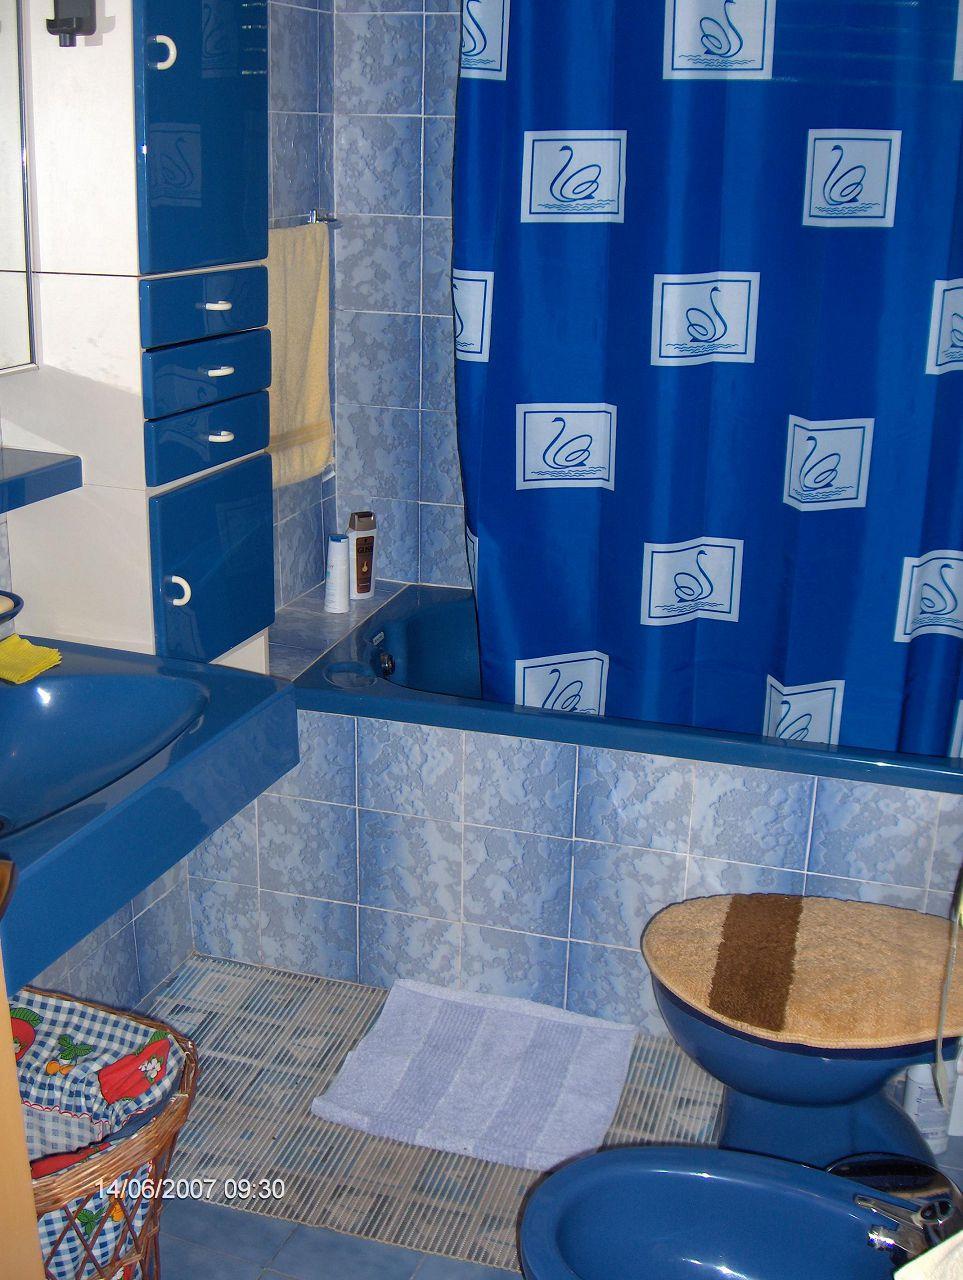 0203VRBO - Vrboska - Appartementen Kroatië - R1(2): badkamer met toilet